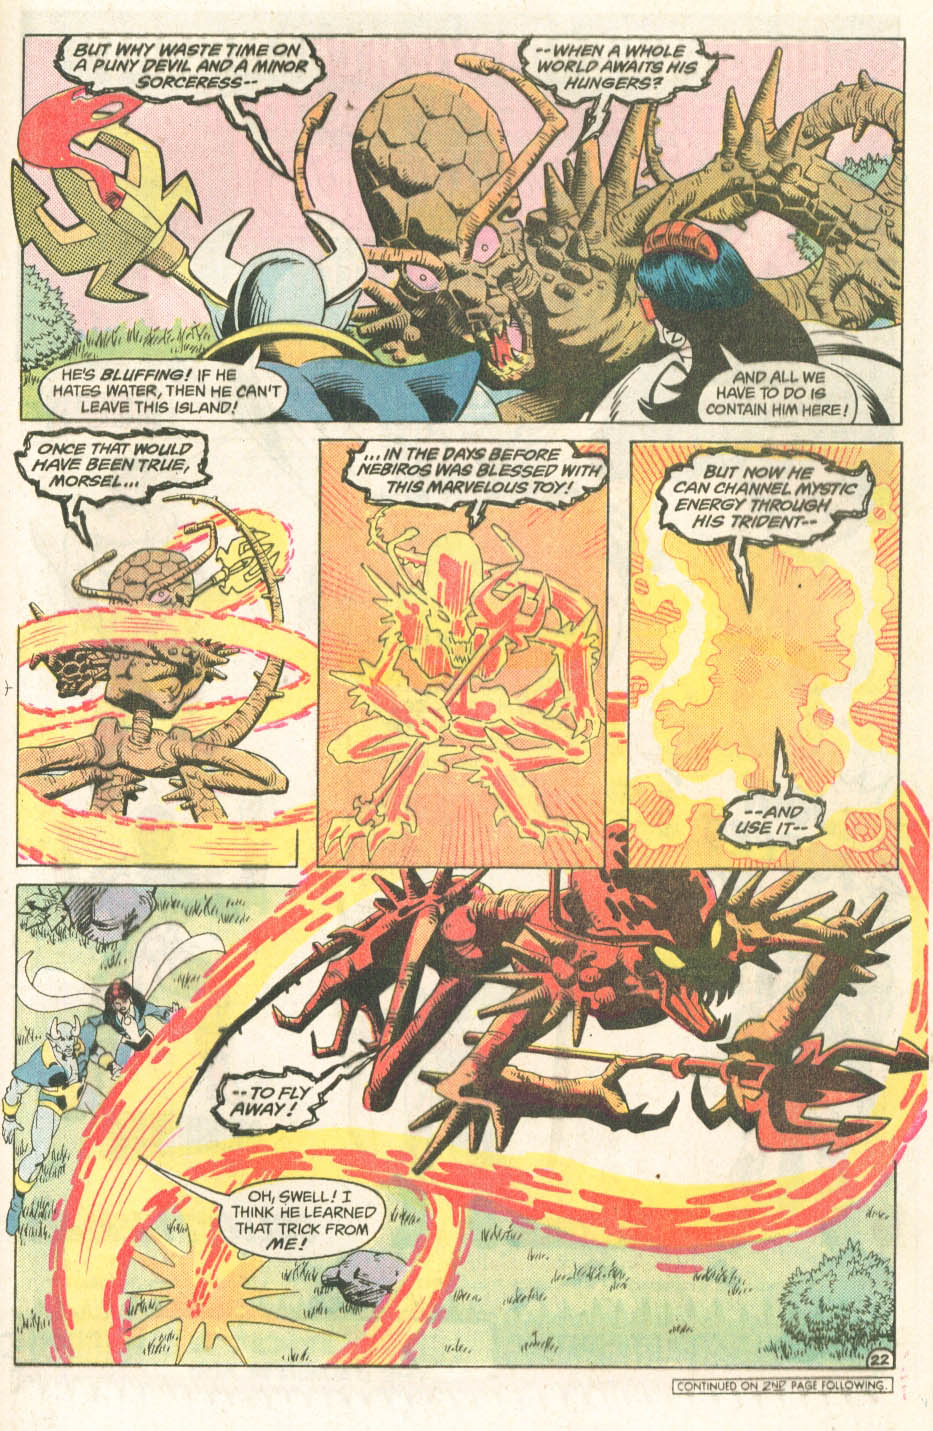 Blue Devil #4 - Read Blue Devil Issue #4 Page 24